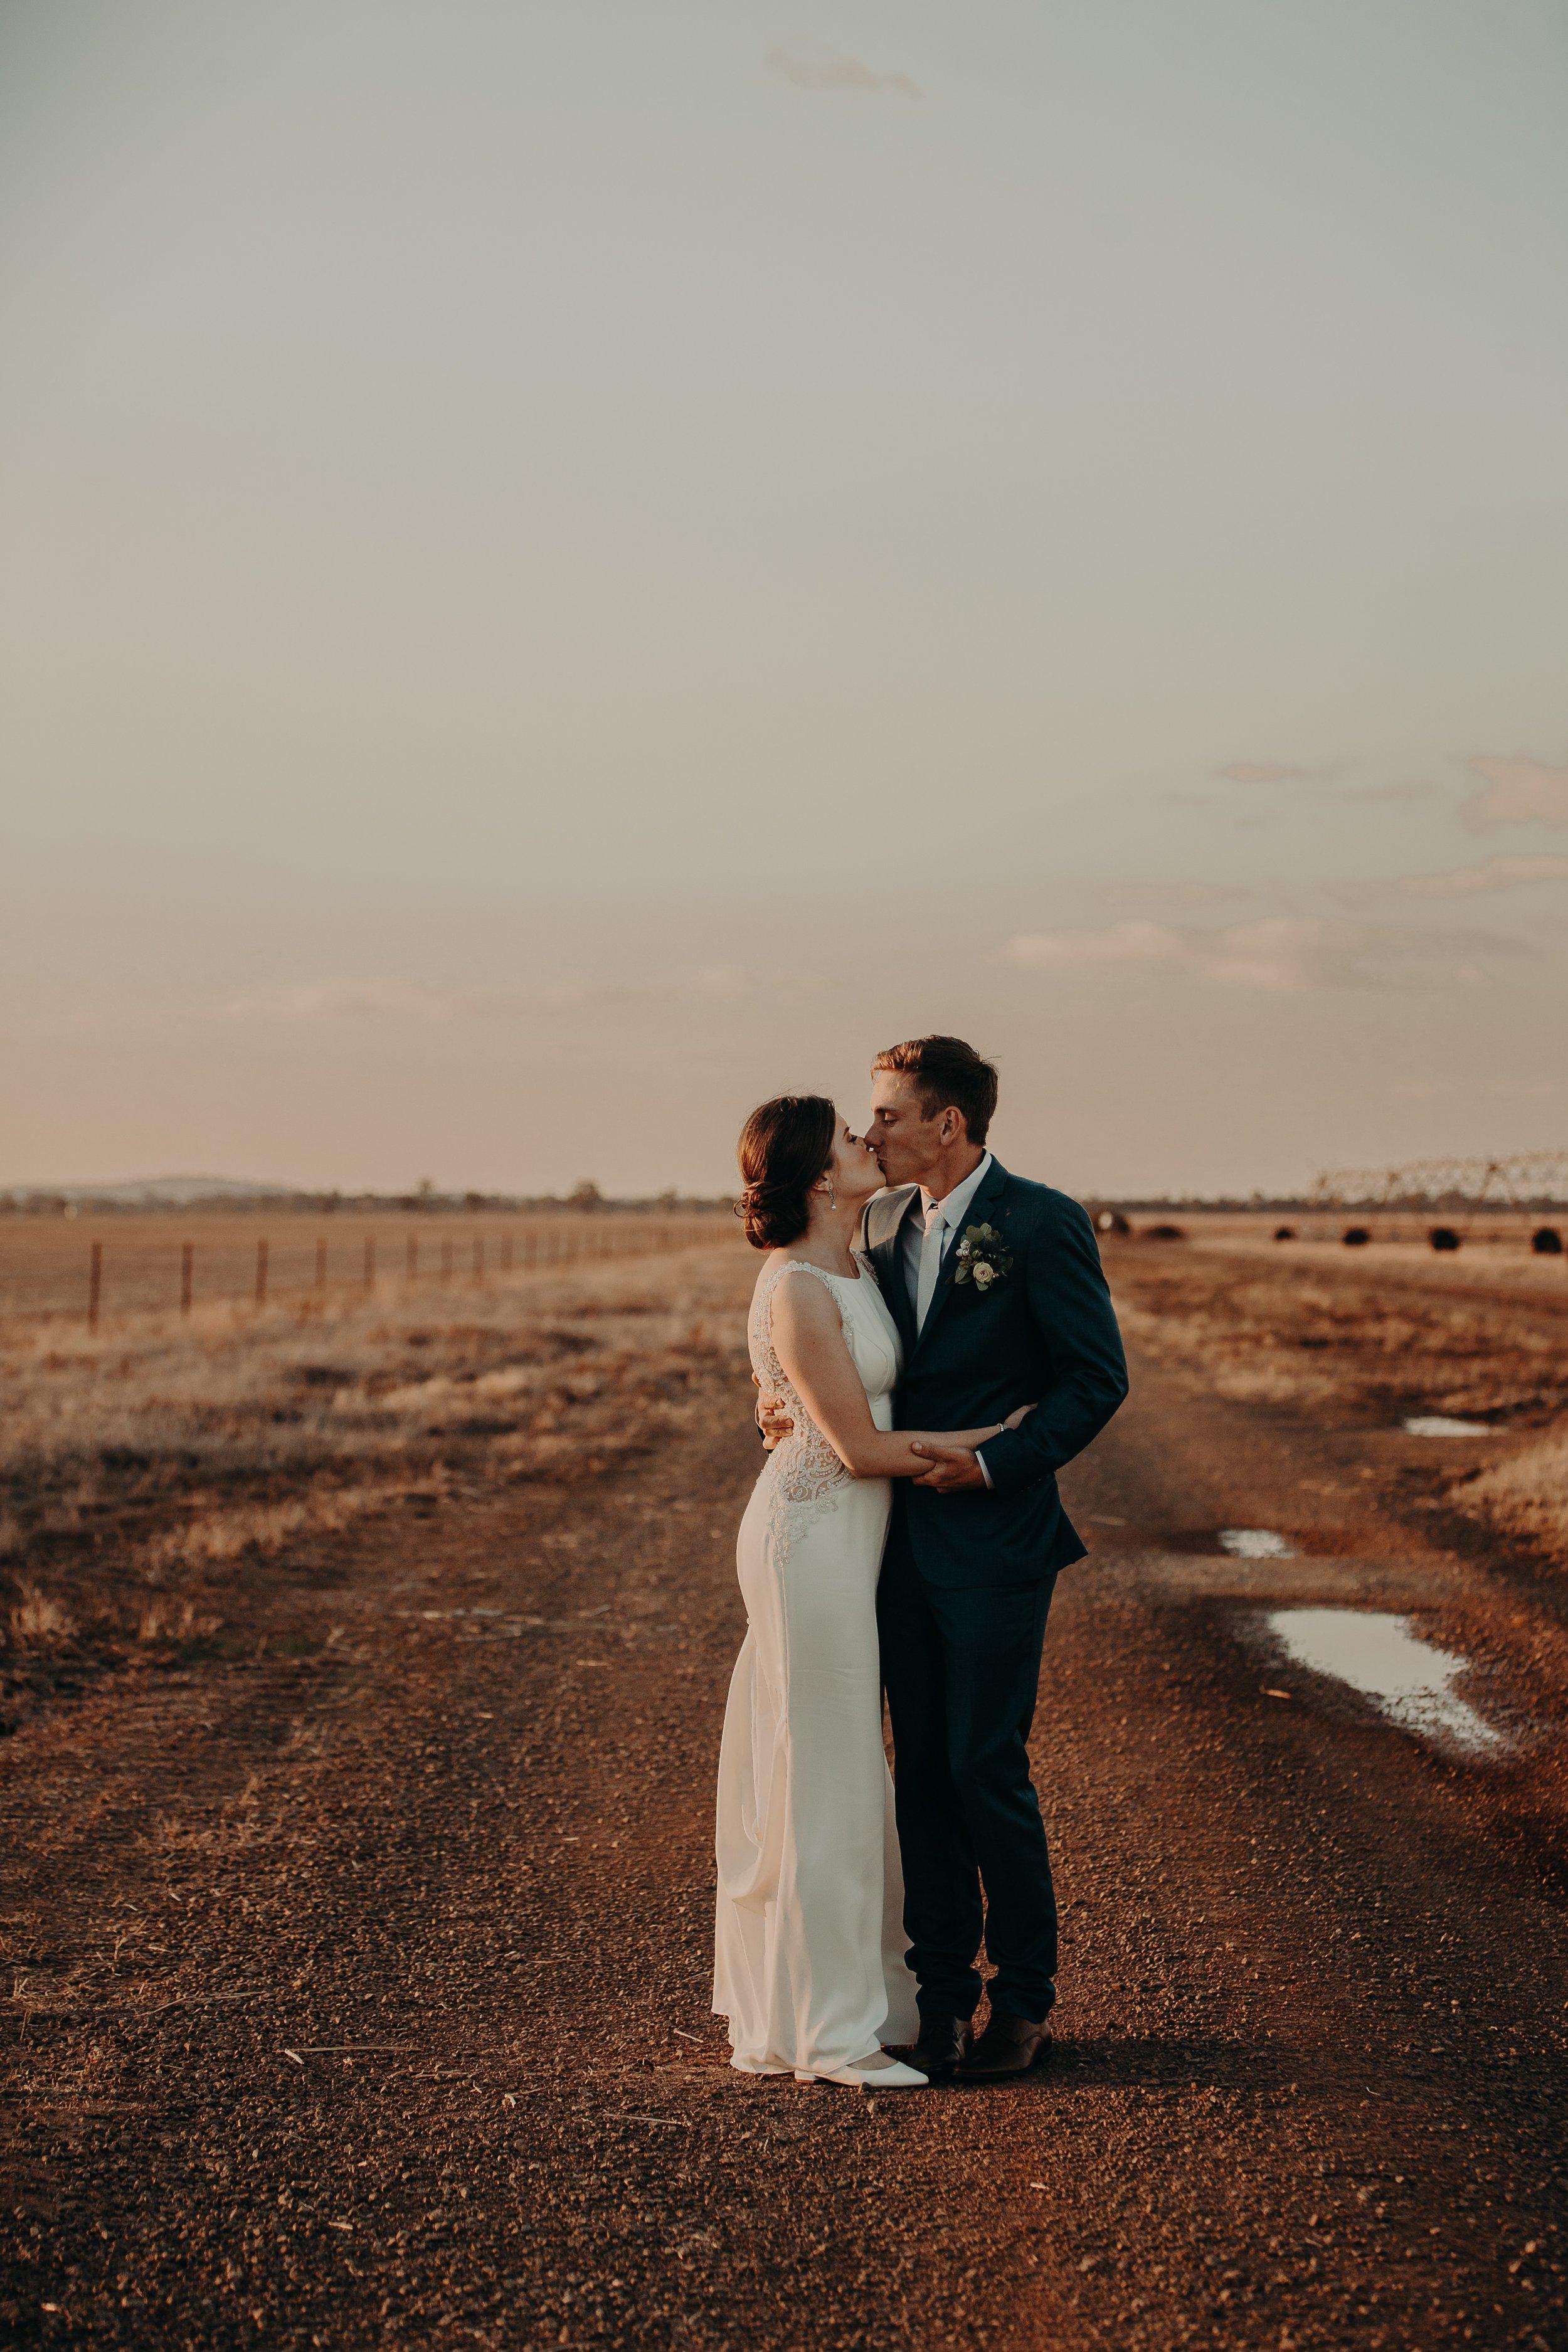 mickalathomas_puremacphotography_weddingphotographer_couplephotographer_Sheppartonphotographer_2564.jpg